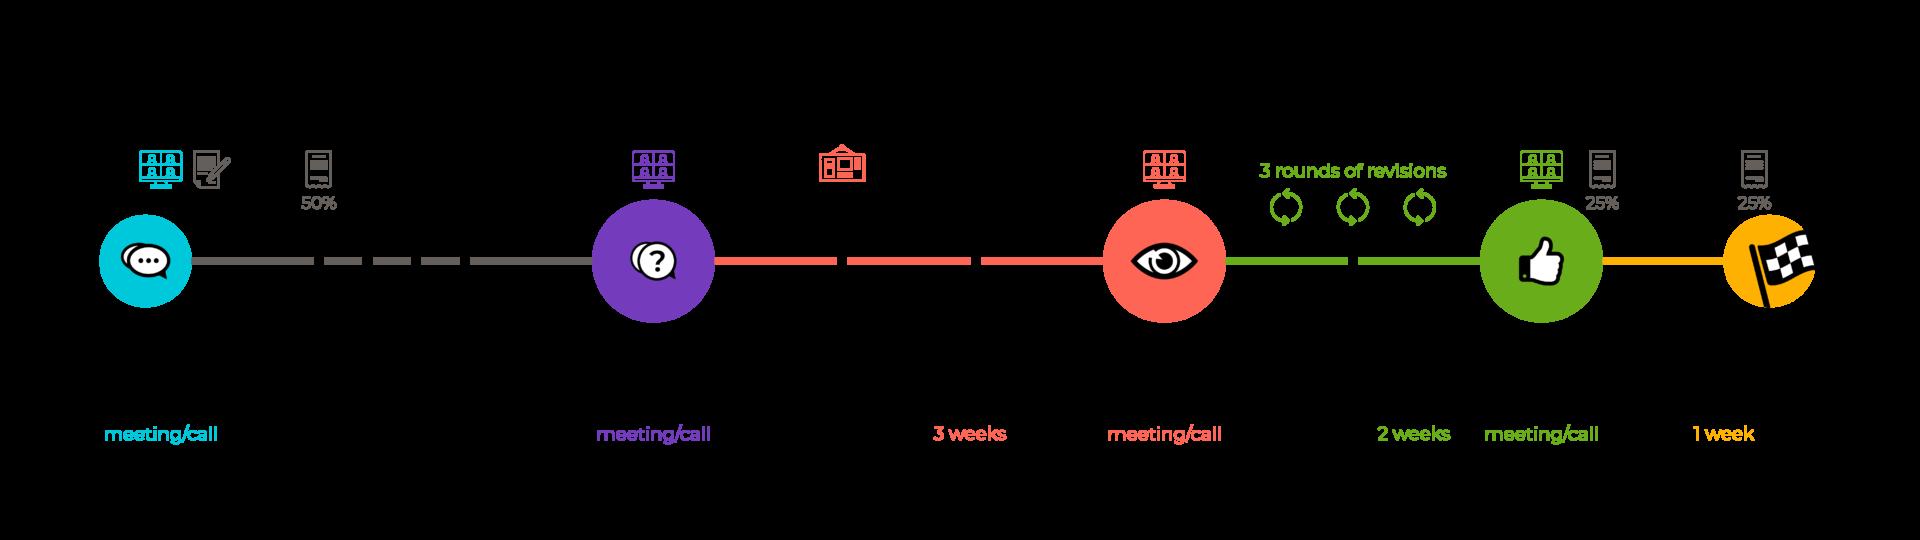 Wellness Brand Design Process Timeline for The Brand Identity Recipe